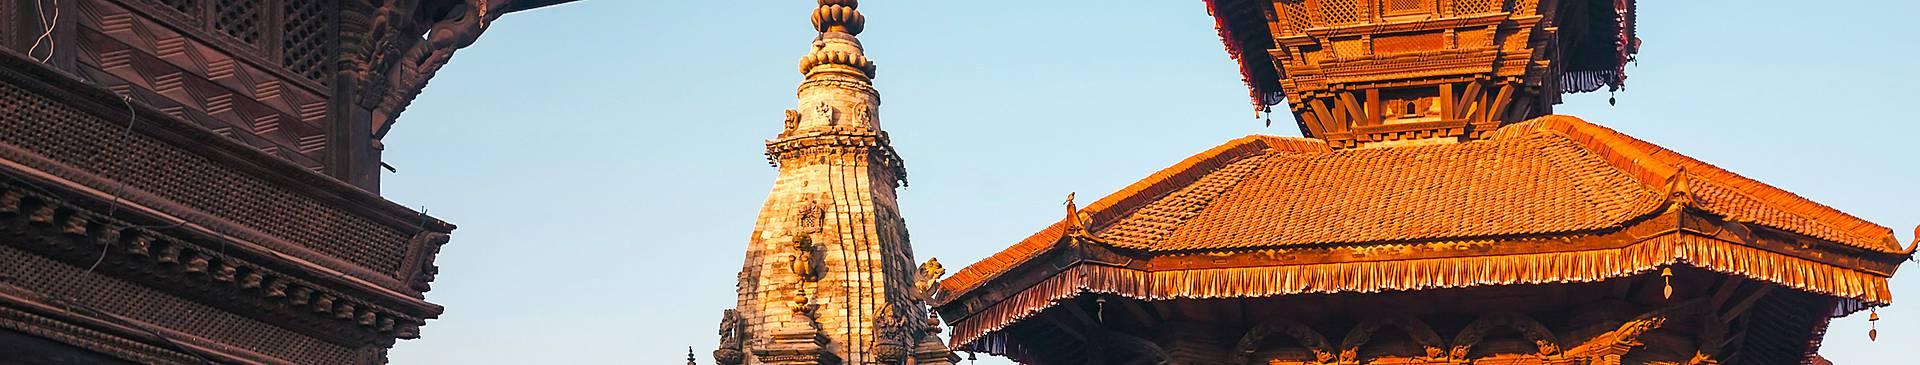 Two weeks in Nepal